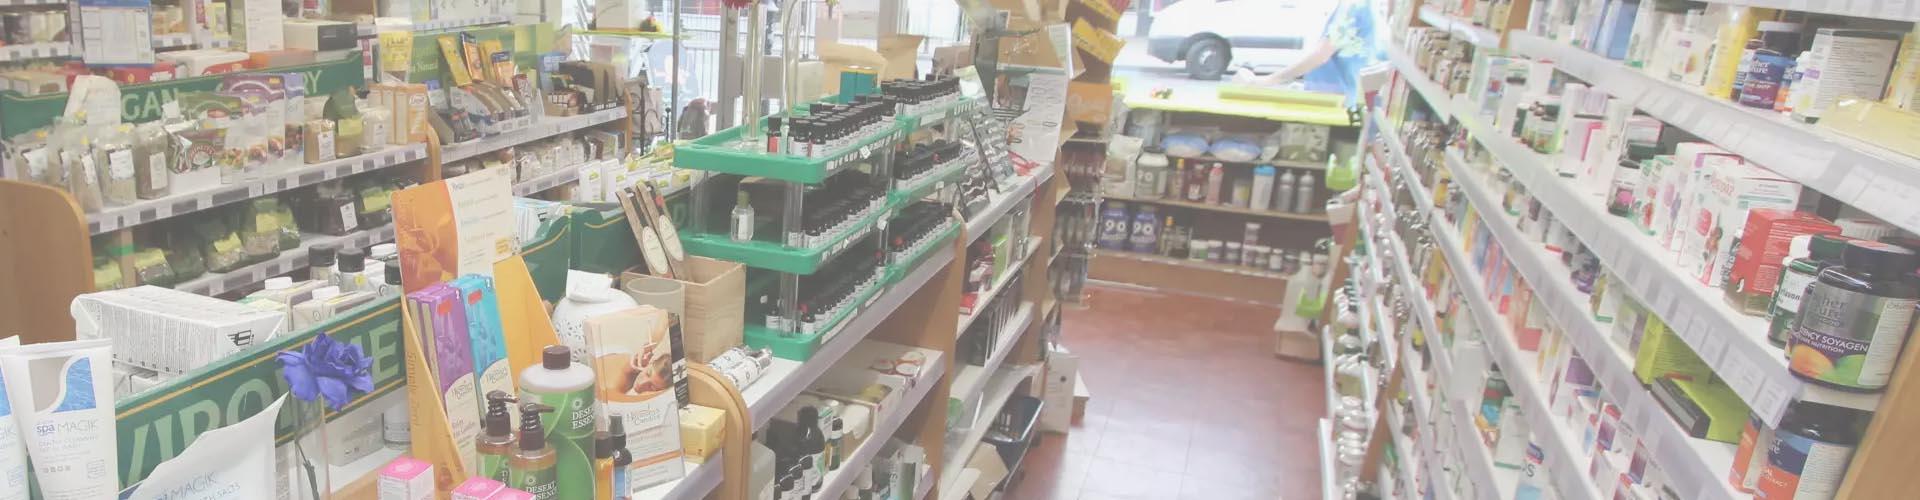 vitamin shop pos system, Vitamin Shop POS System